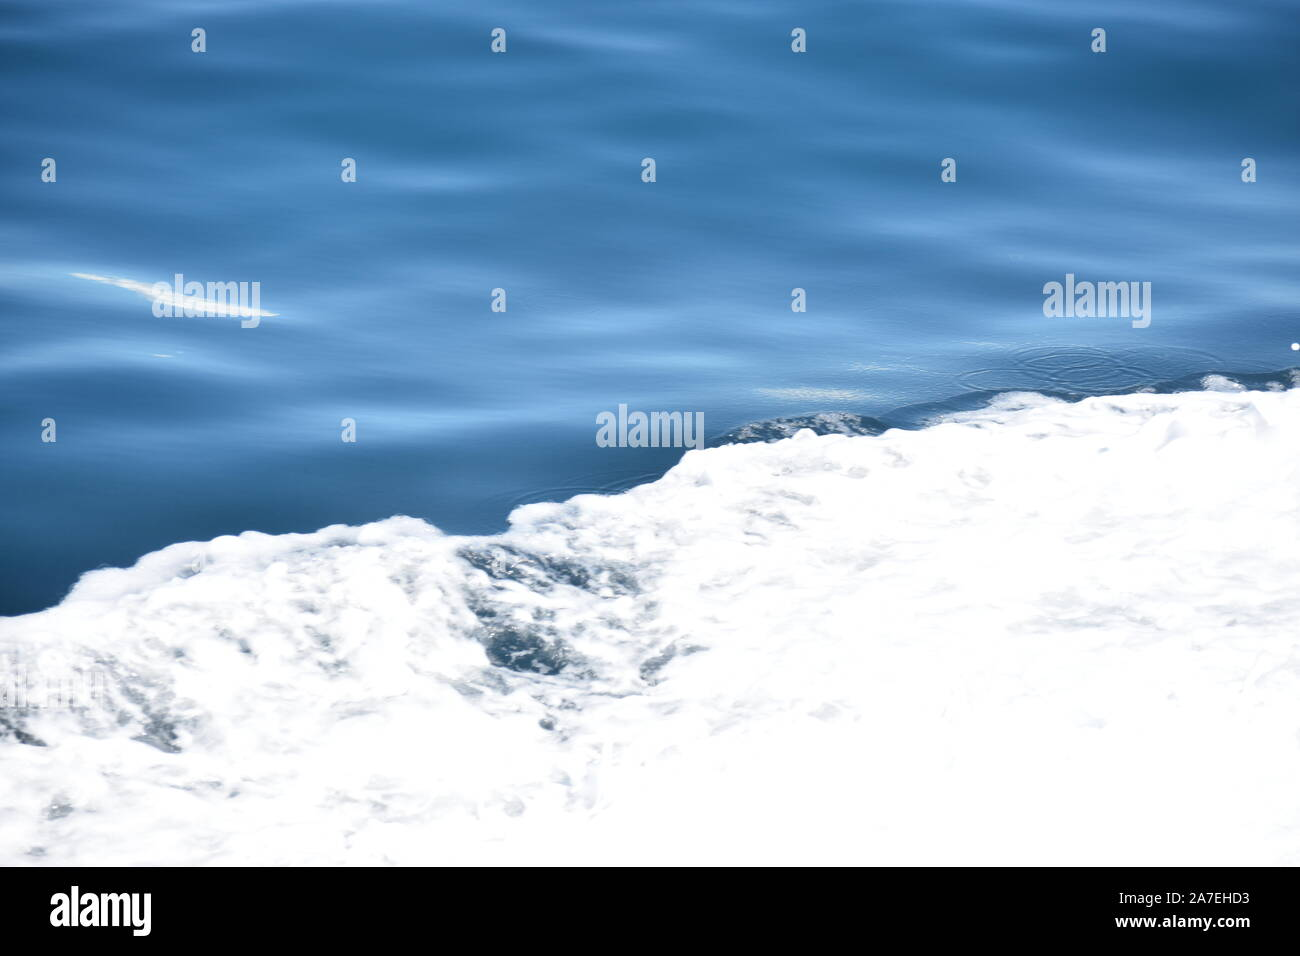 Resumen Antecedentes de agua Foto de stock